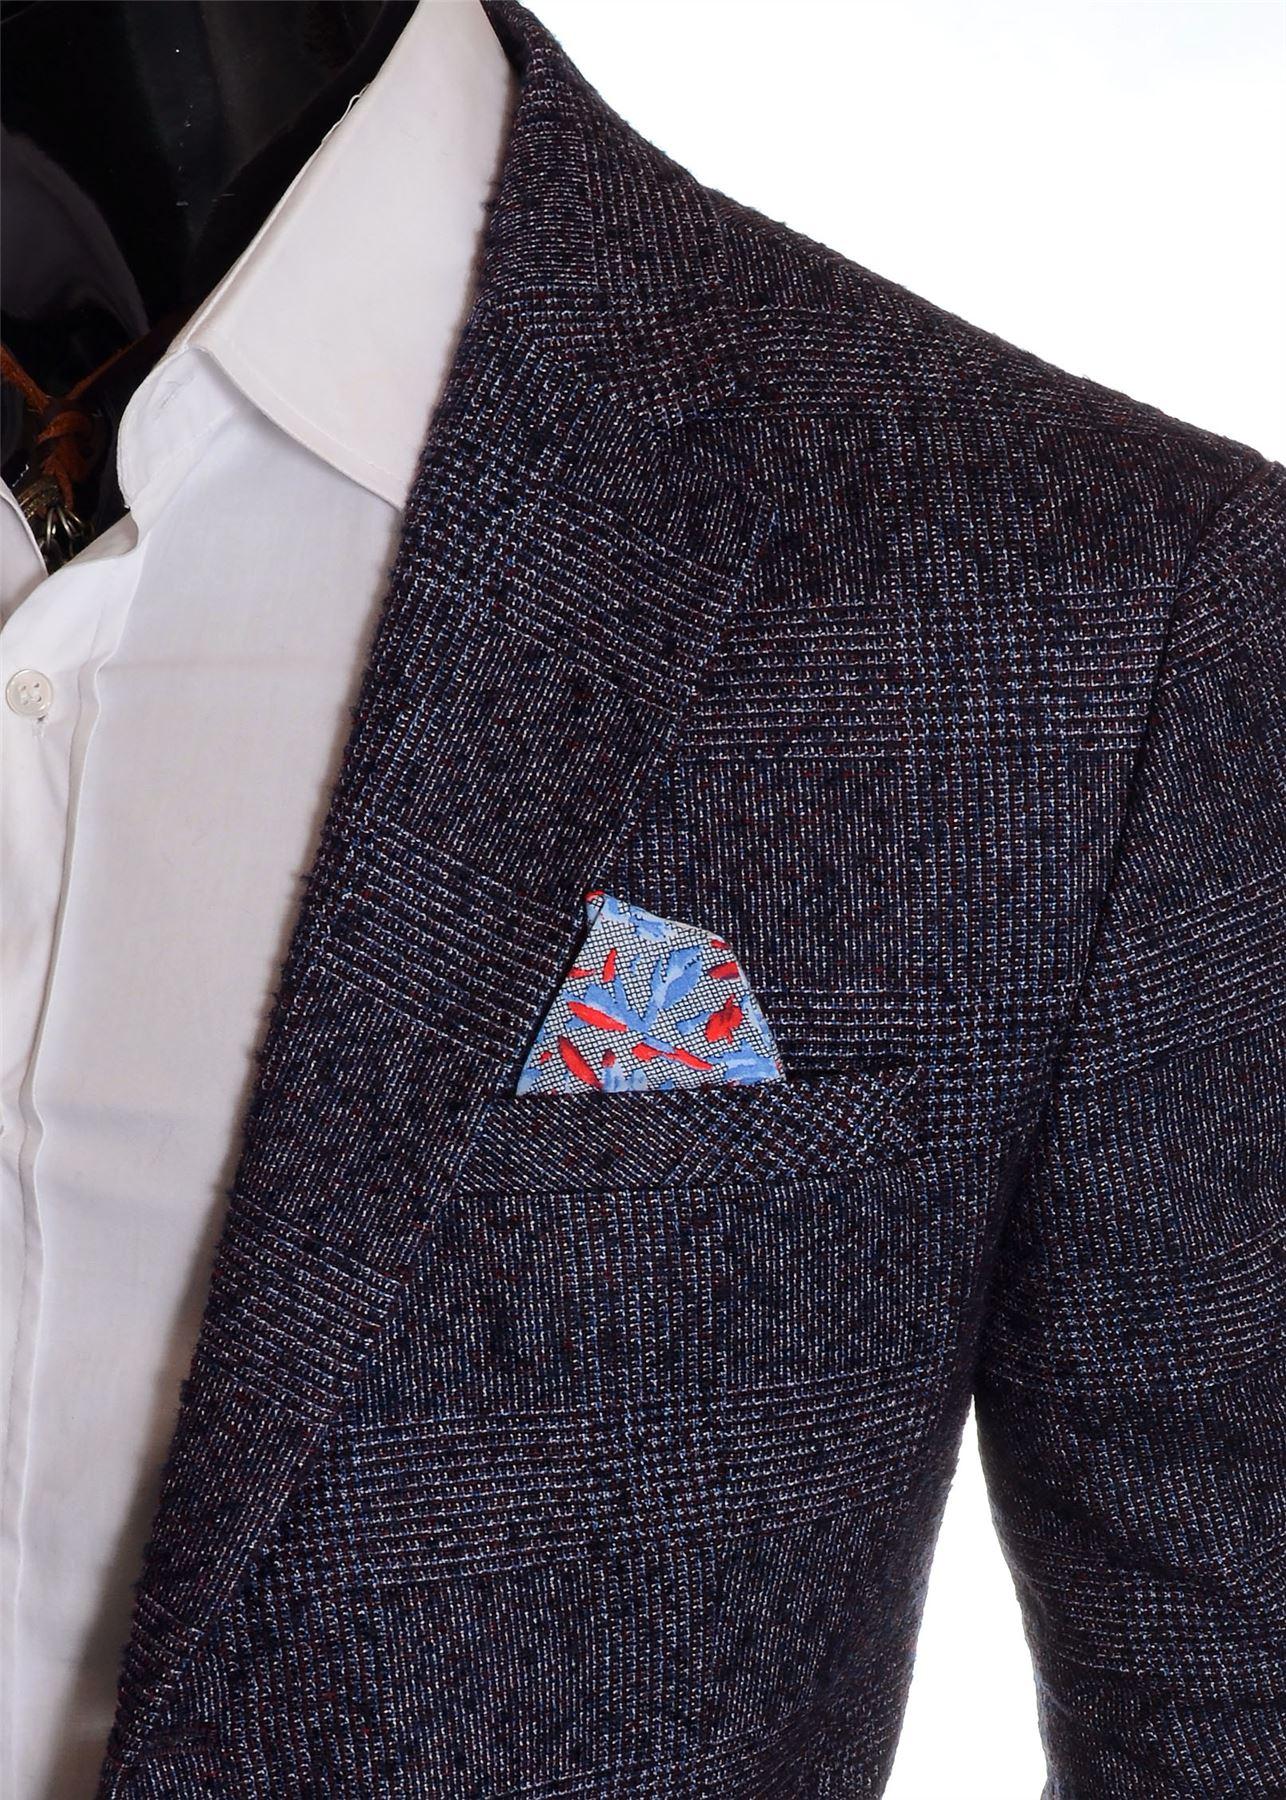 Men-039-s-Checkered-Coat-3-4-Long-Tweed-Cashmere-Wool-Trendy-Formal-Winter-Overcoat thumbnail 20